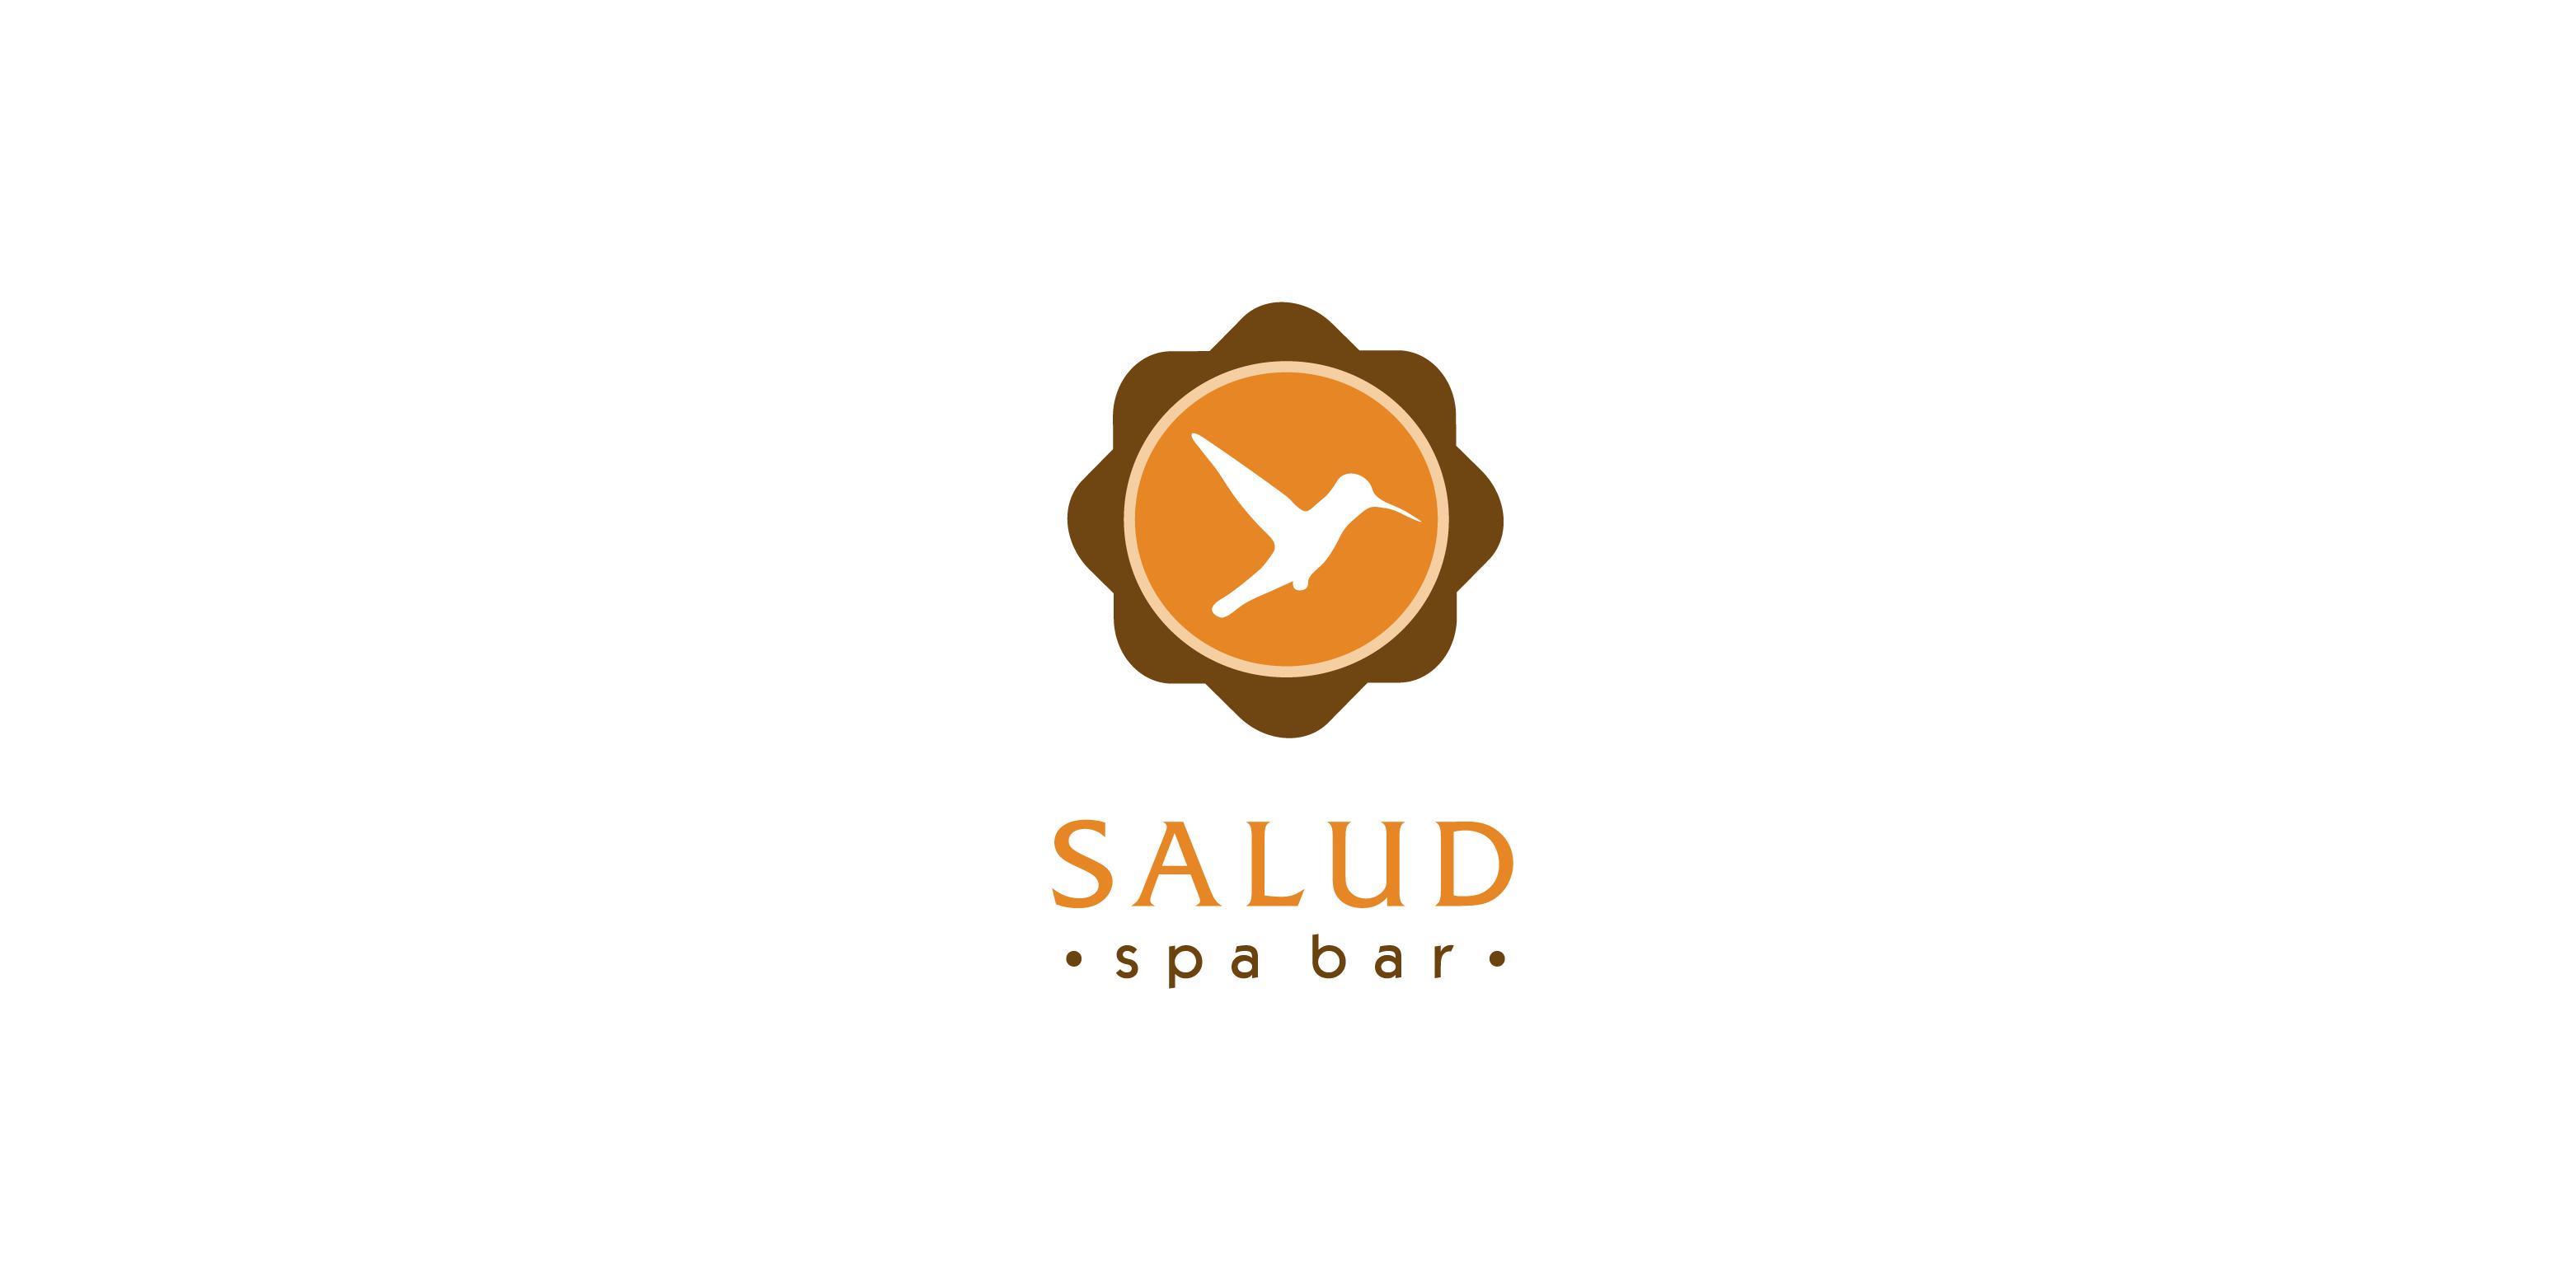 salud_spa_bar_logo-01